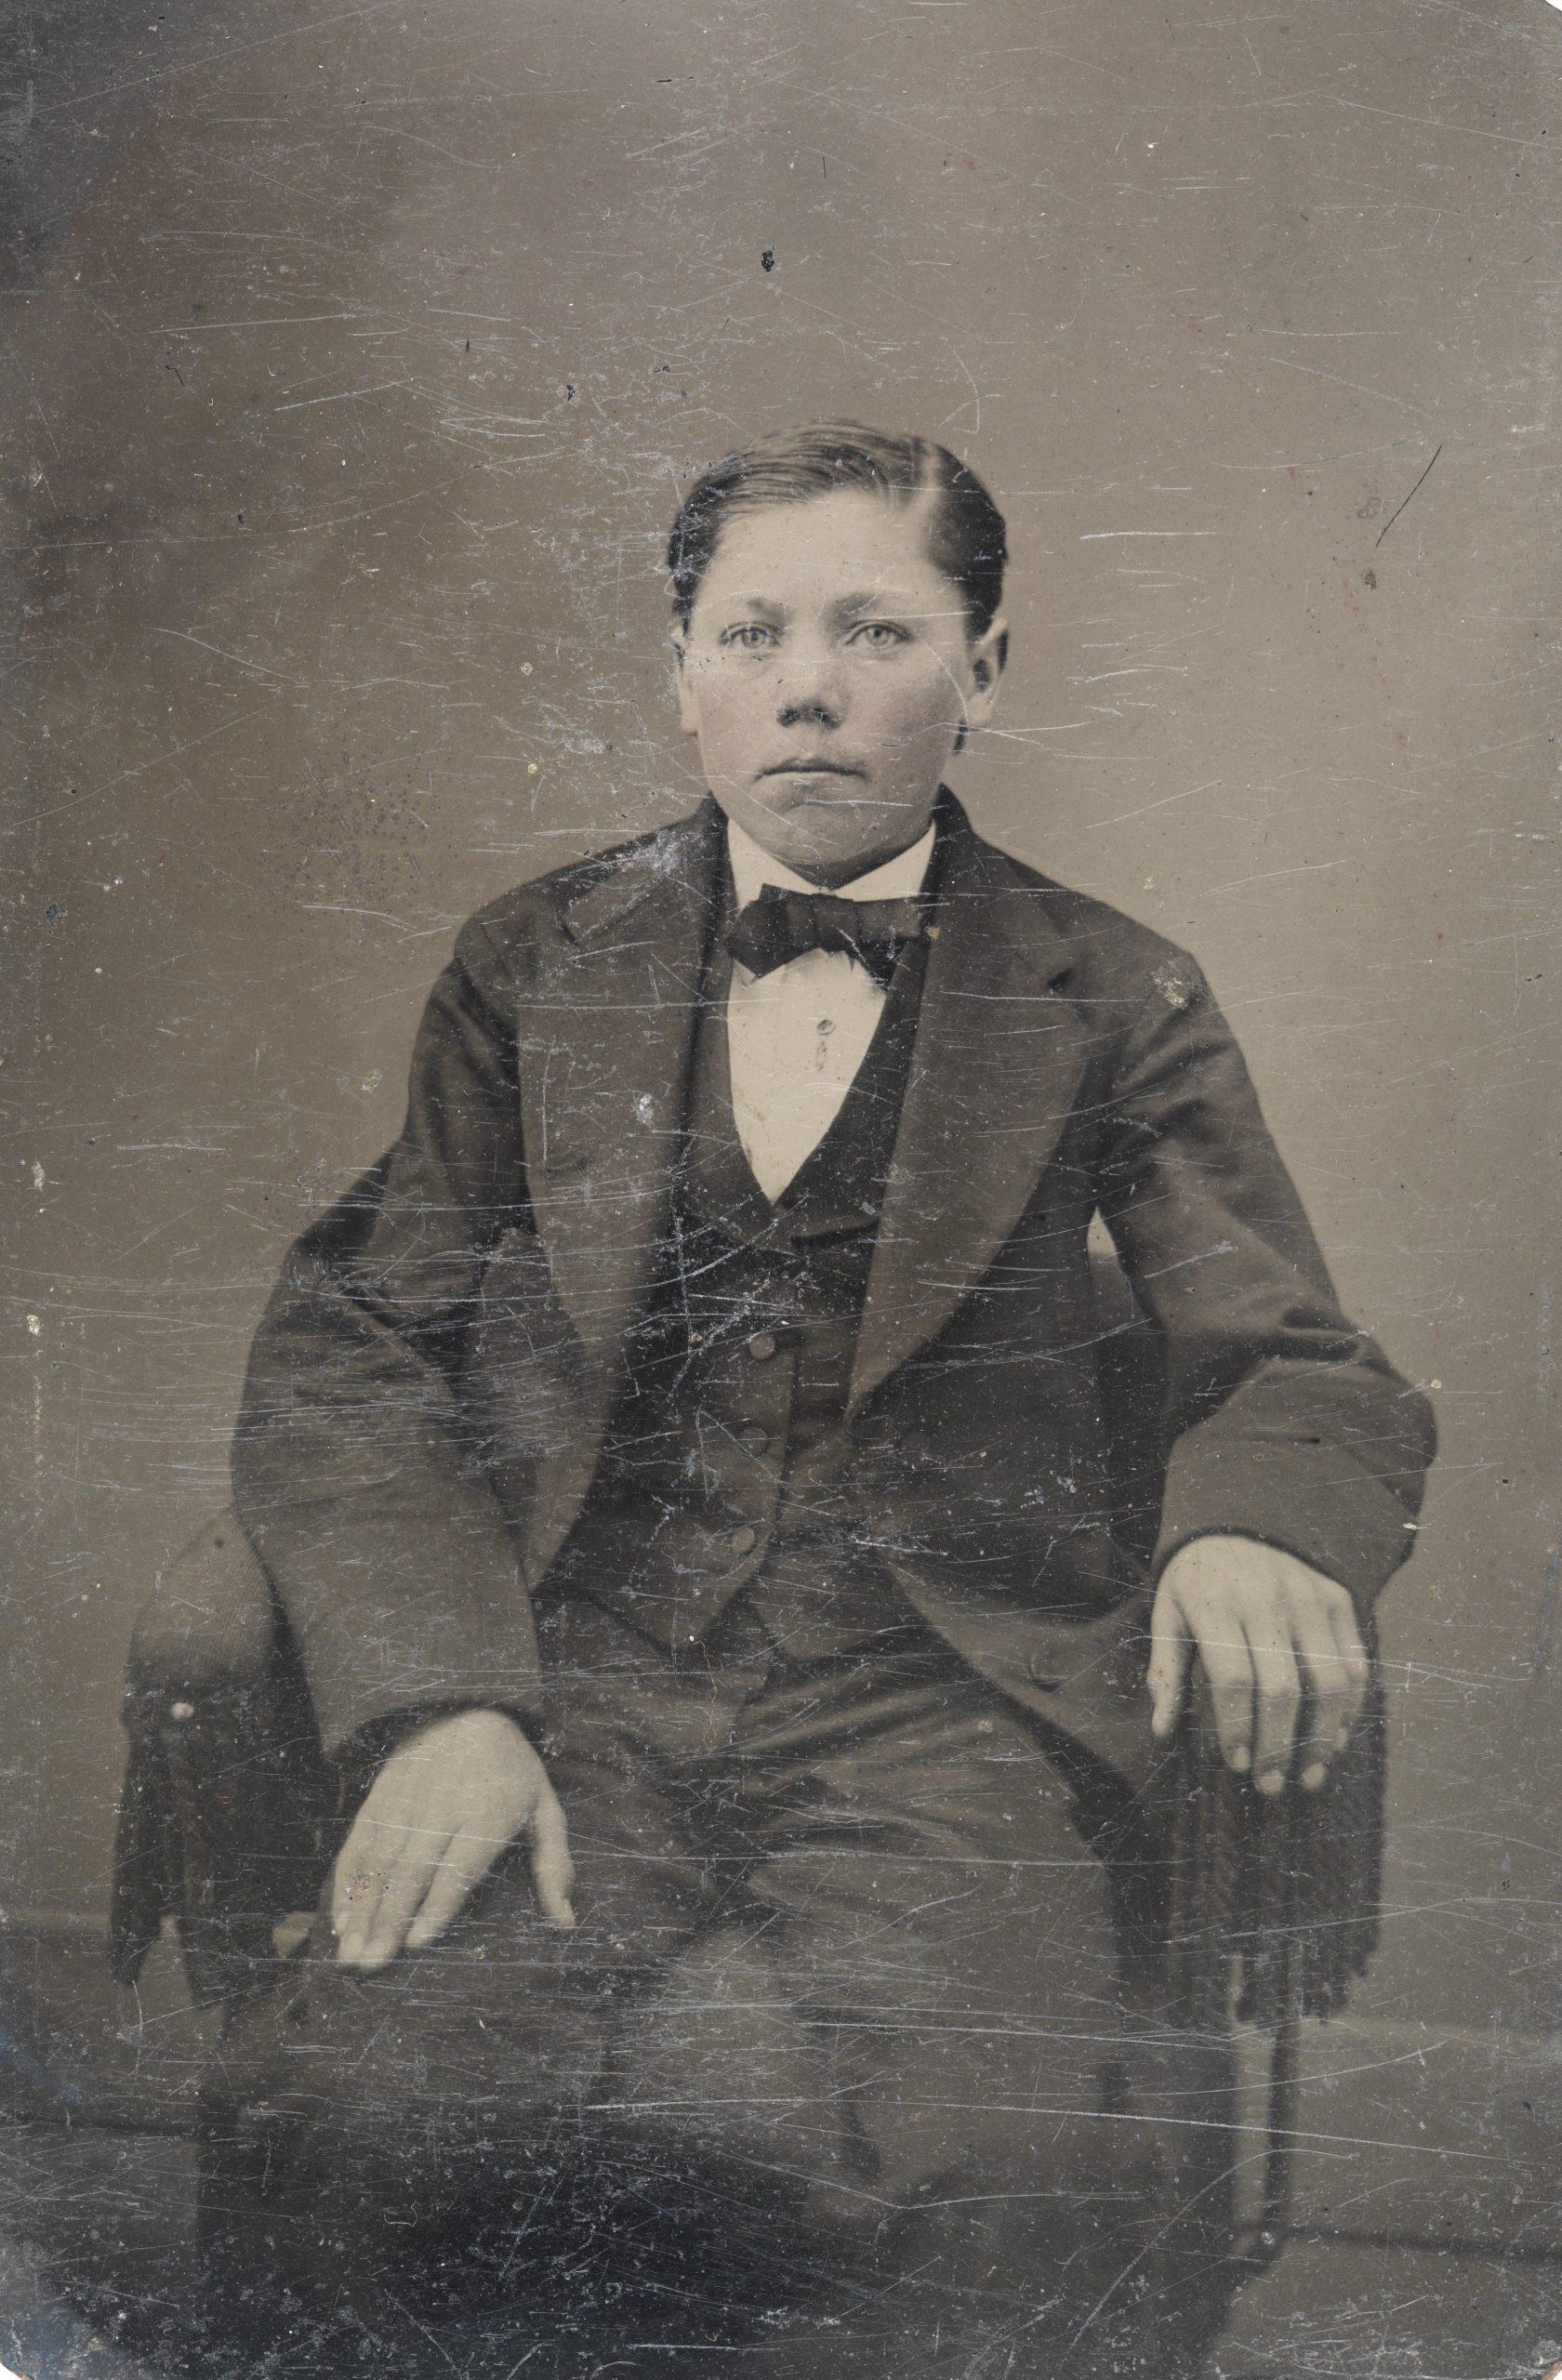 boy in suit, 1856-1900